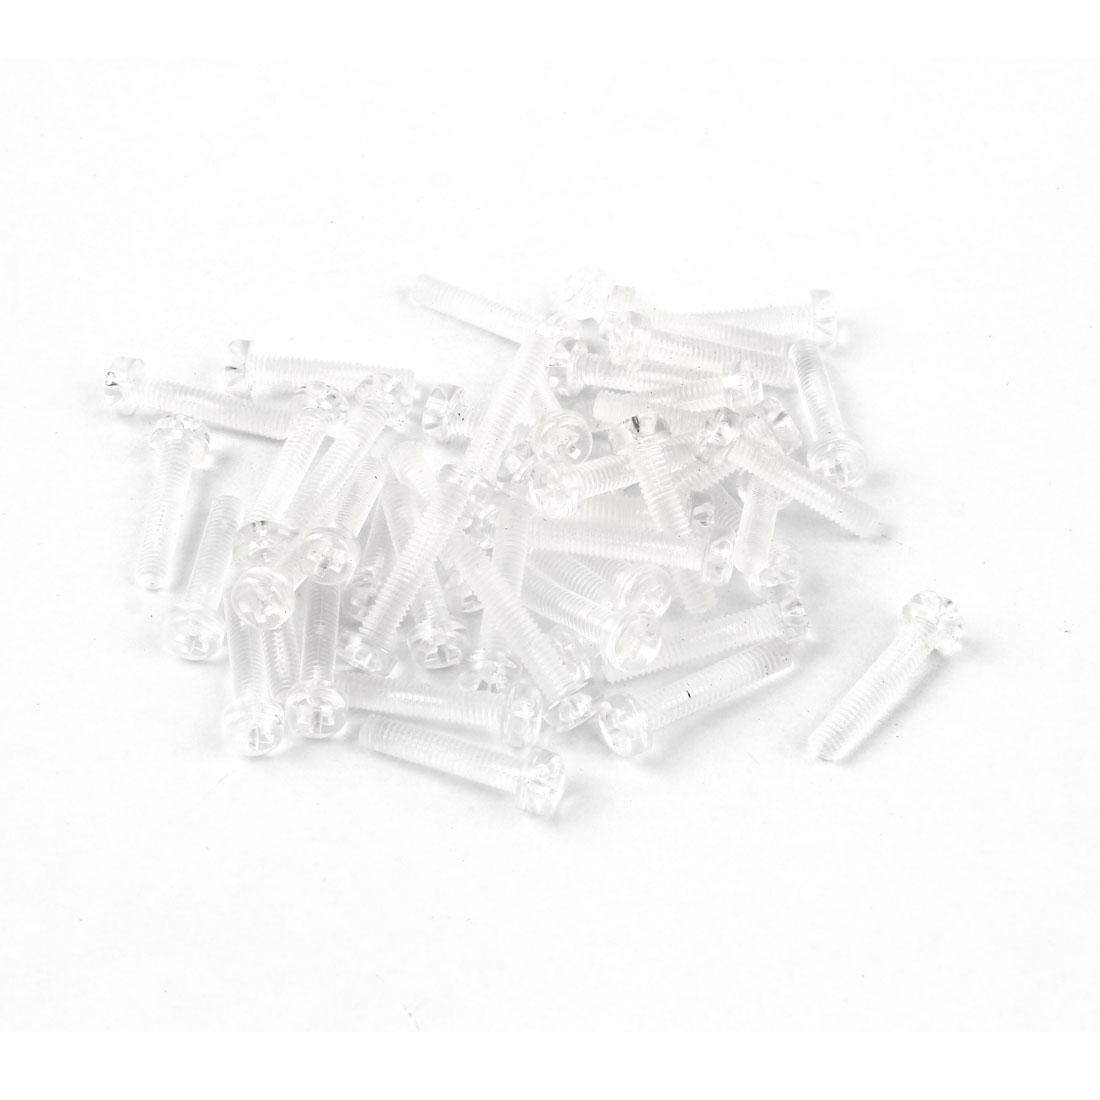 M4 x 20mm Clear Polycarbonate Phillips Round Head Machine Screws 50pcs